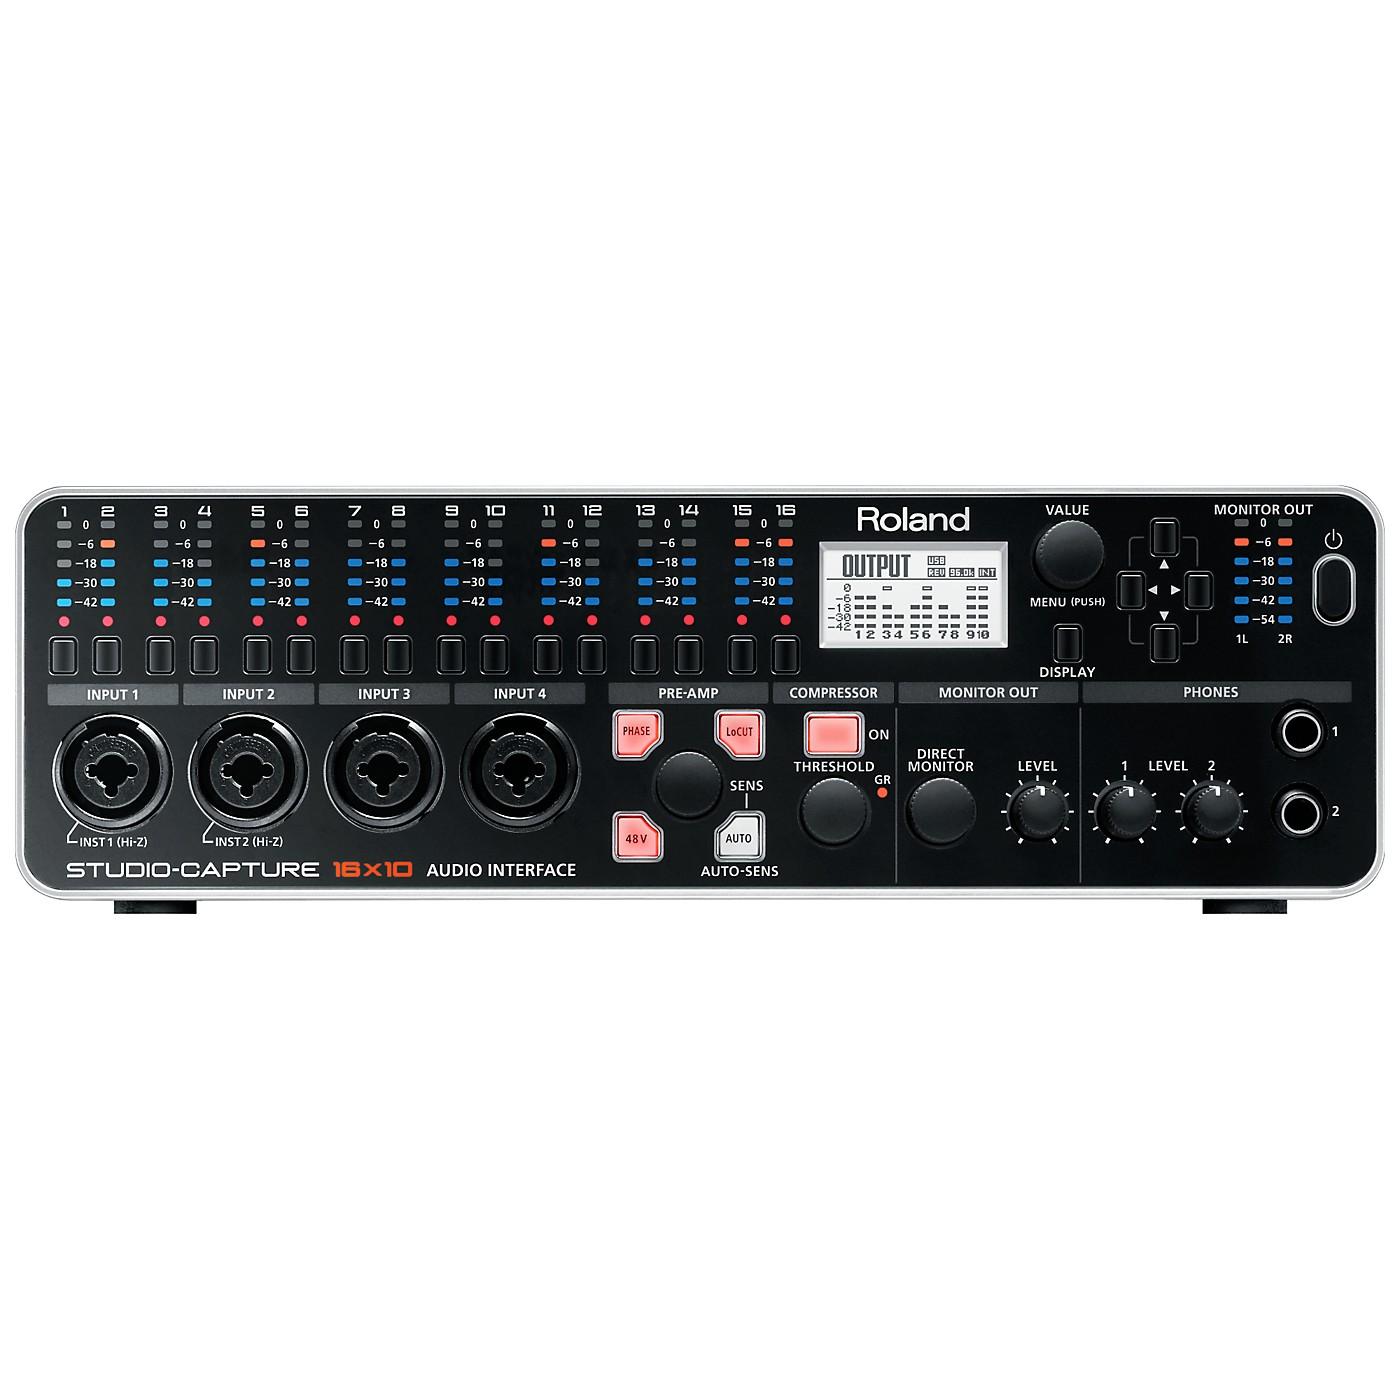 Roland STUDIO-CAPTURE USB 2.0 Audio Interface thumbnail